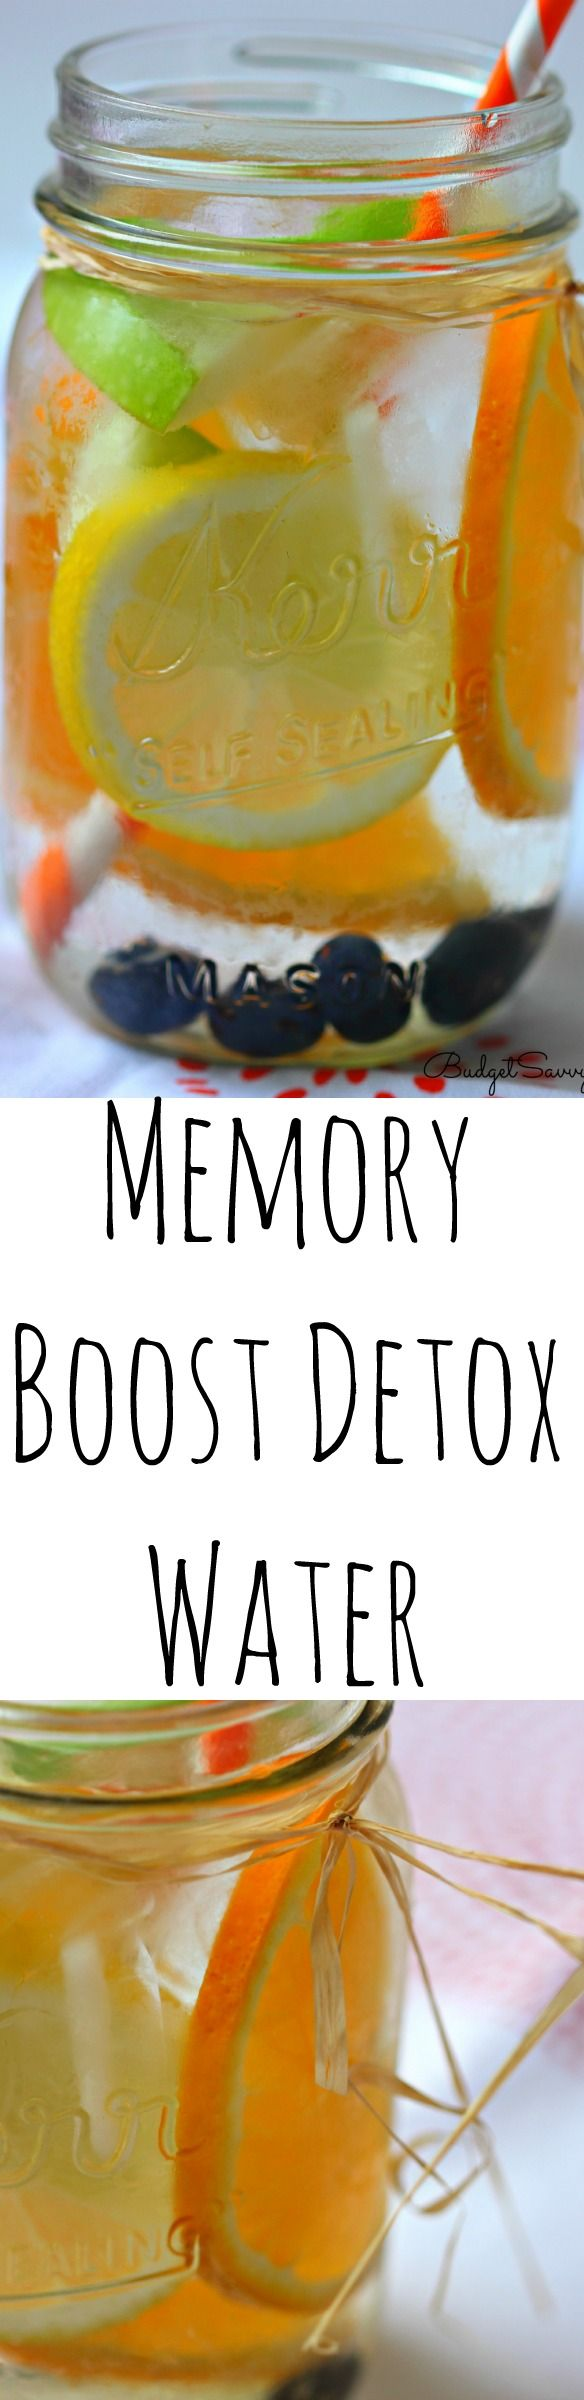 Memory Boost Detox Water Recipe Recipe Detox Water Recipes Water Recipes Detox Water